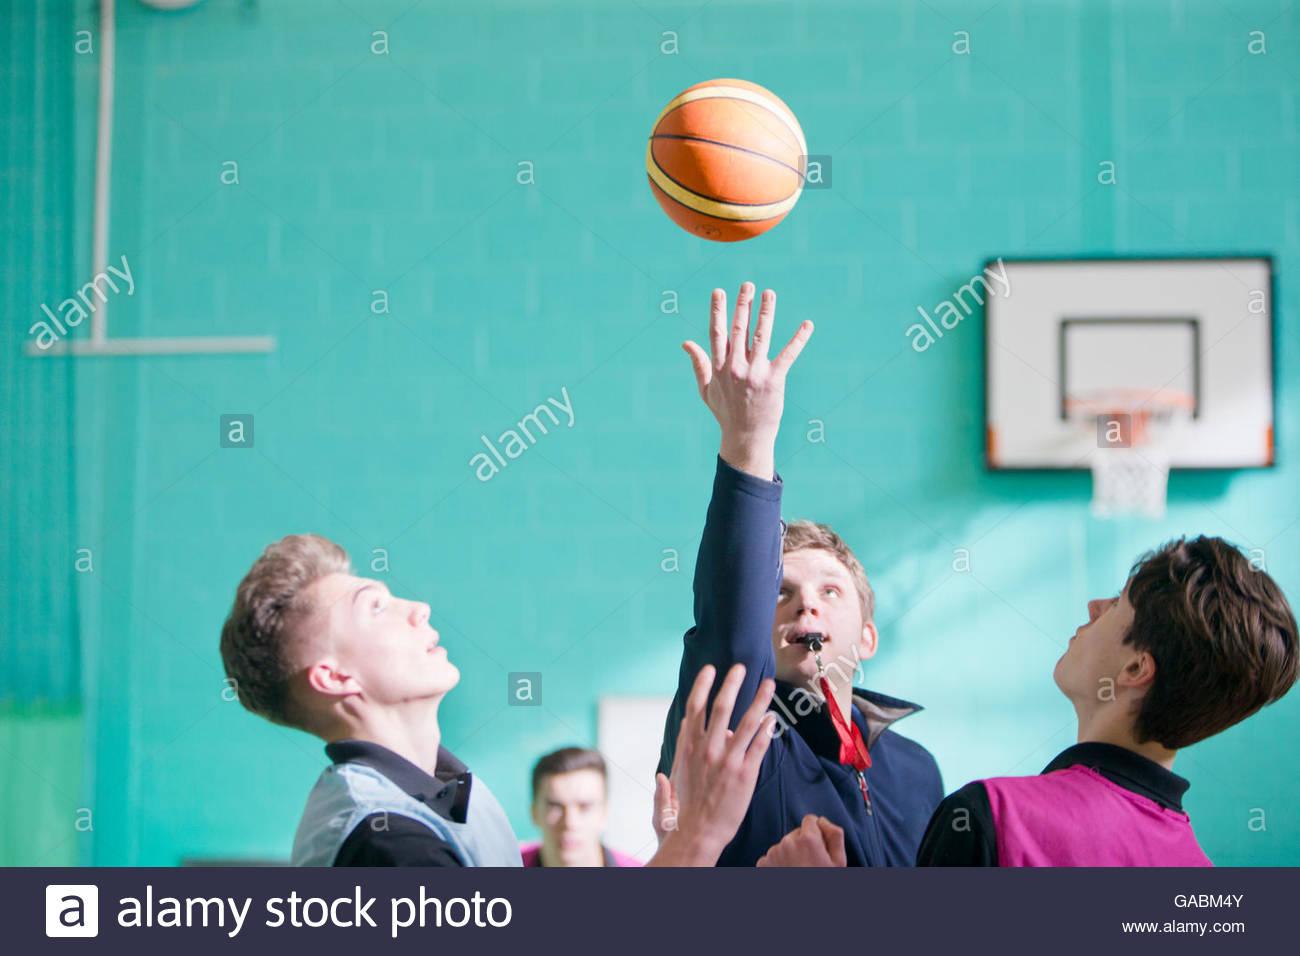 Profesor de gimnasia de empezar la secundaria juego de baloncesto con punta off Imagen De Stock